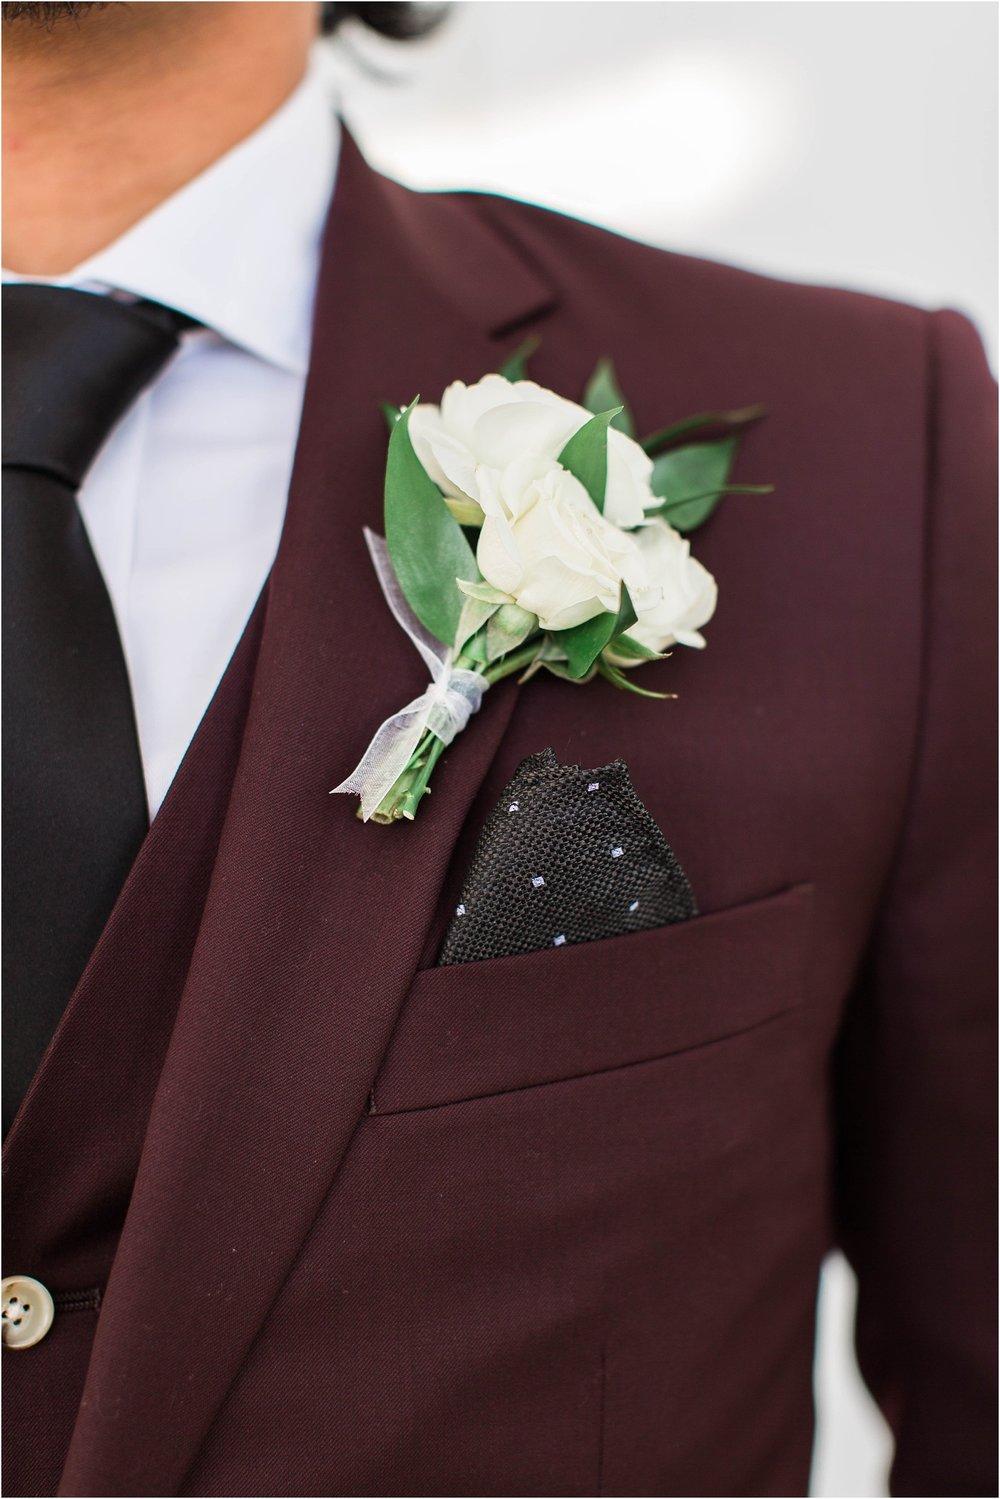 Red-Rose-Convention-Mint-Room-Wedding-Toronto-Mississauga-Brampton-Scarborough-GTA-Pakistani-Indian-Wedding-Engagement-Photographer-Photography_0112.jpg